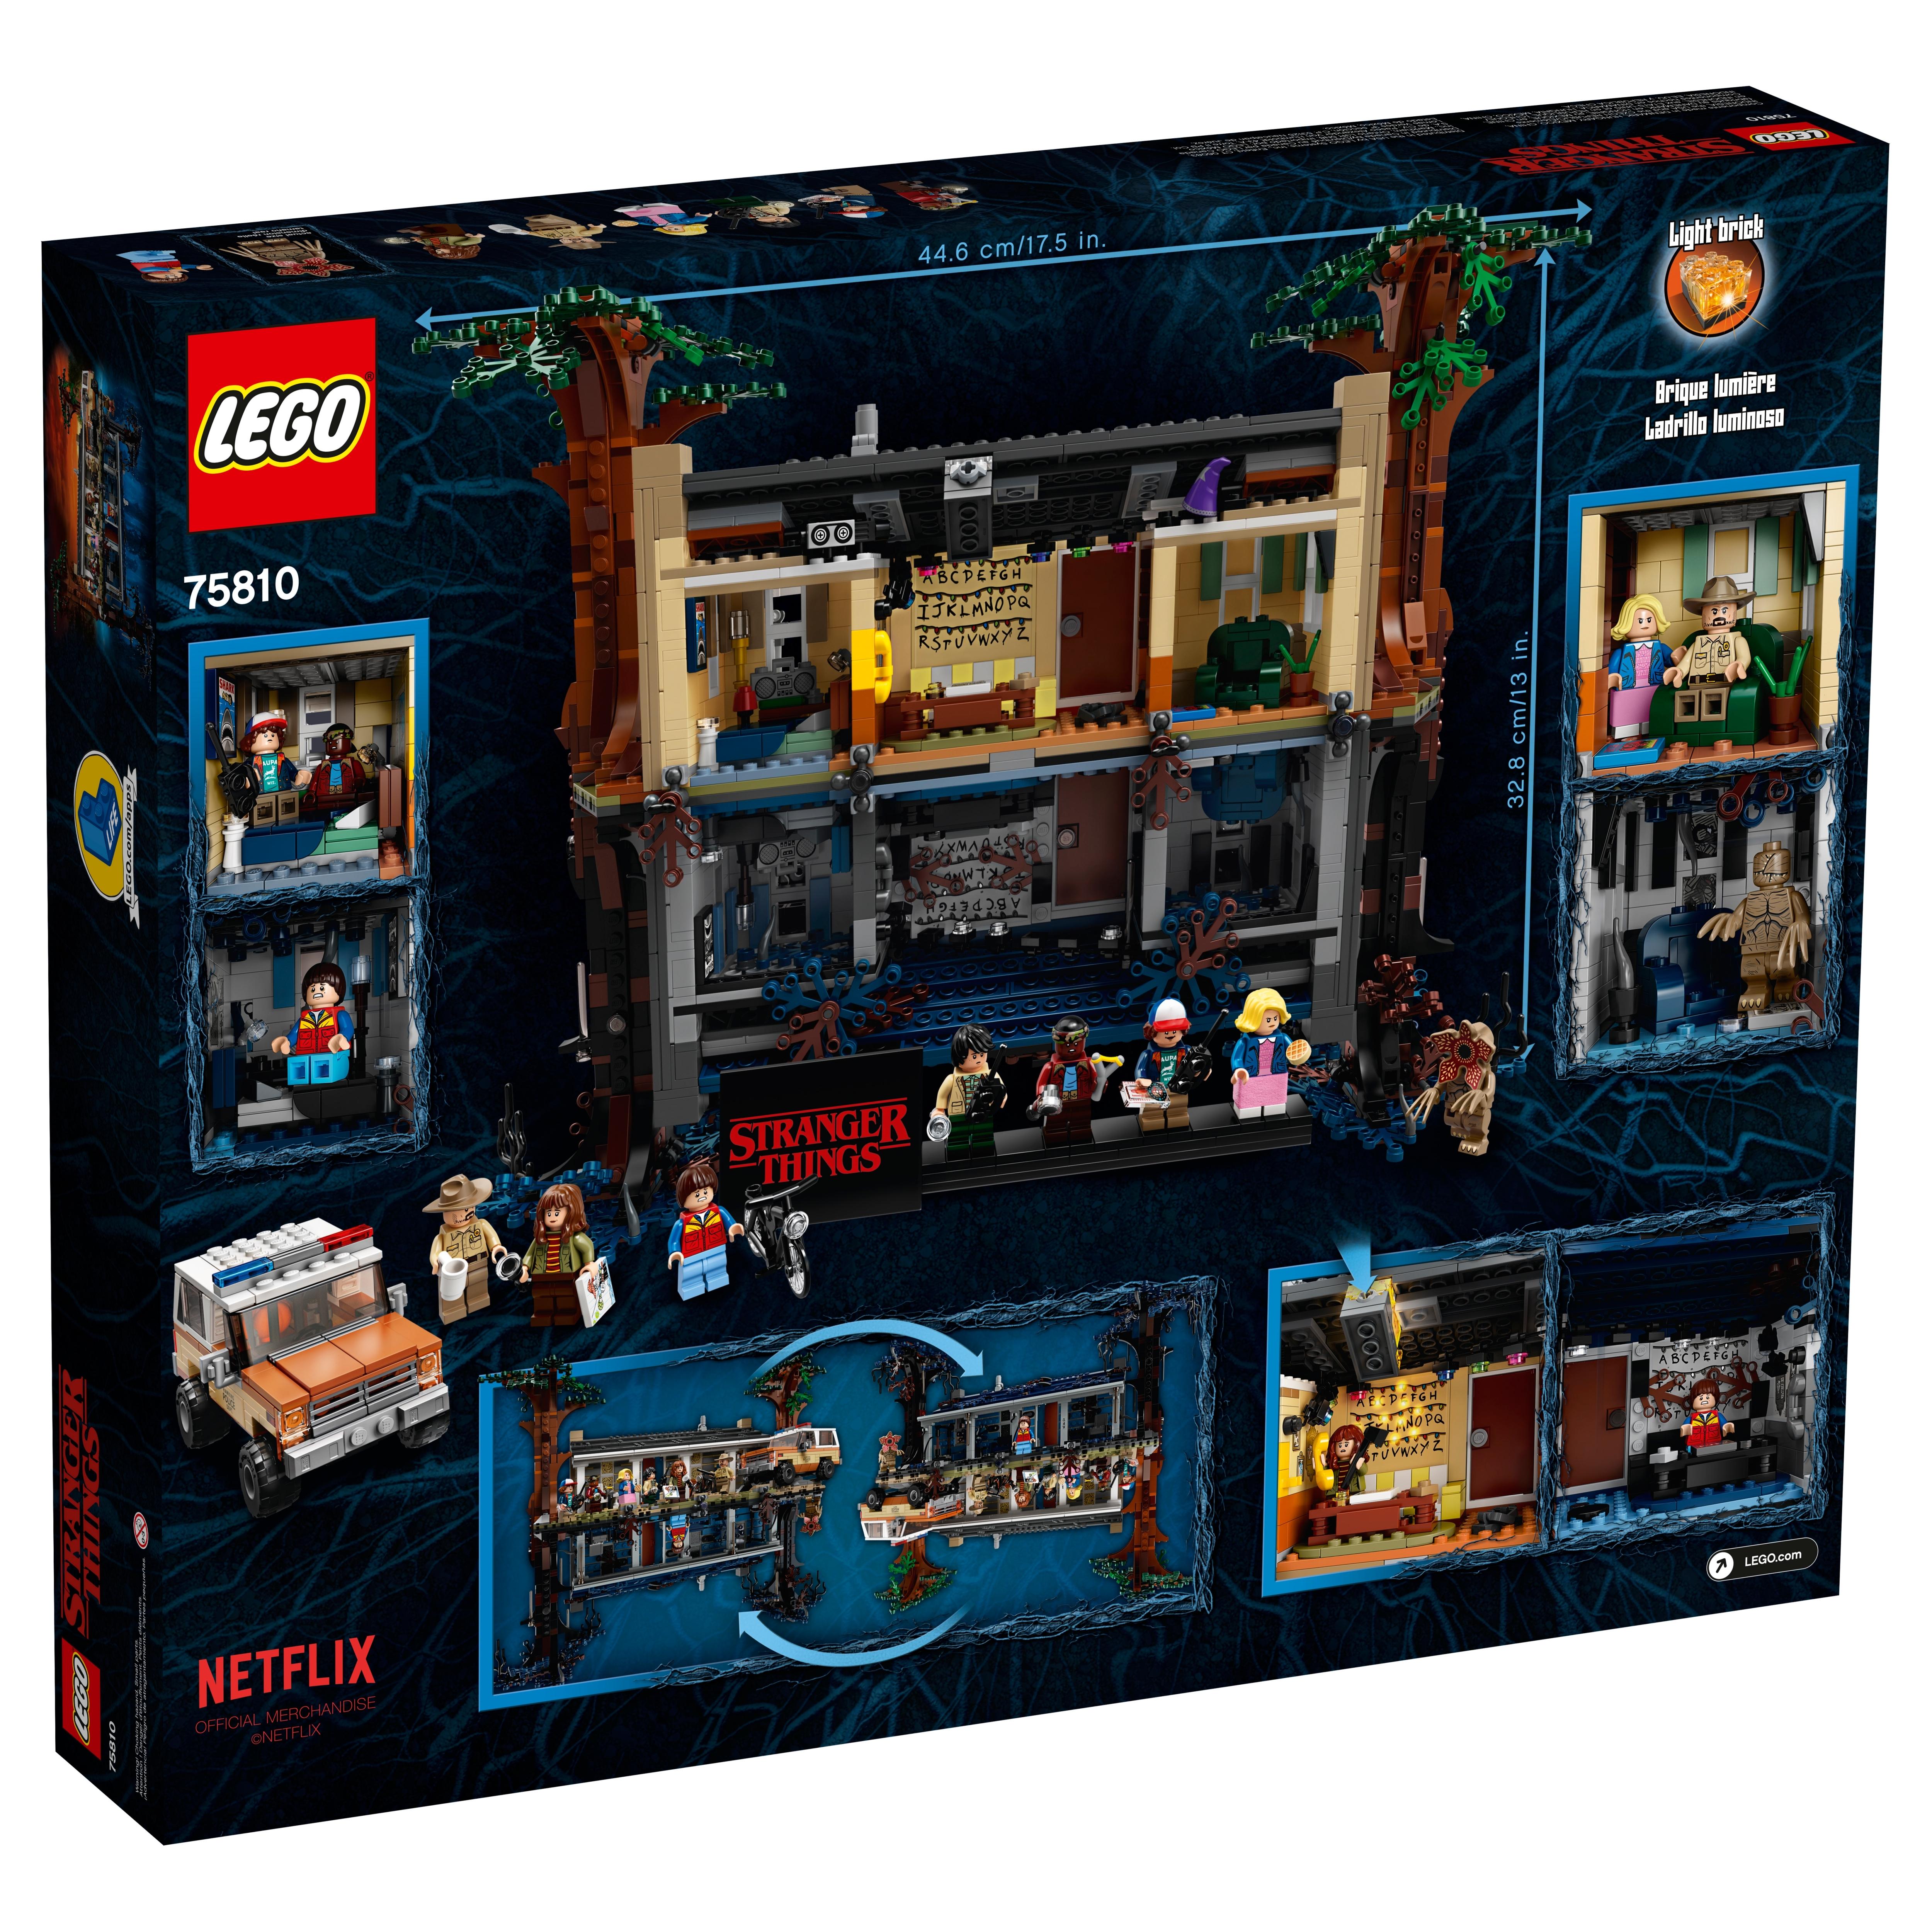 Lego Joyce Byers 75810 The Upside Down Stranger Things Minifigure